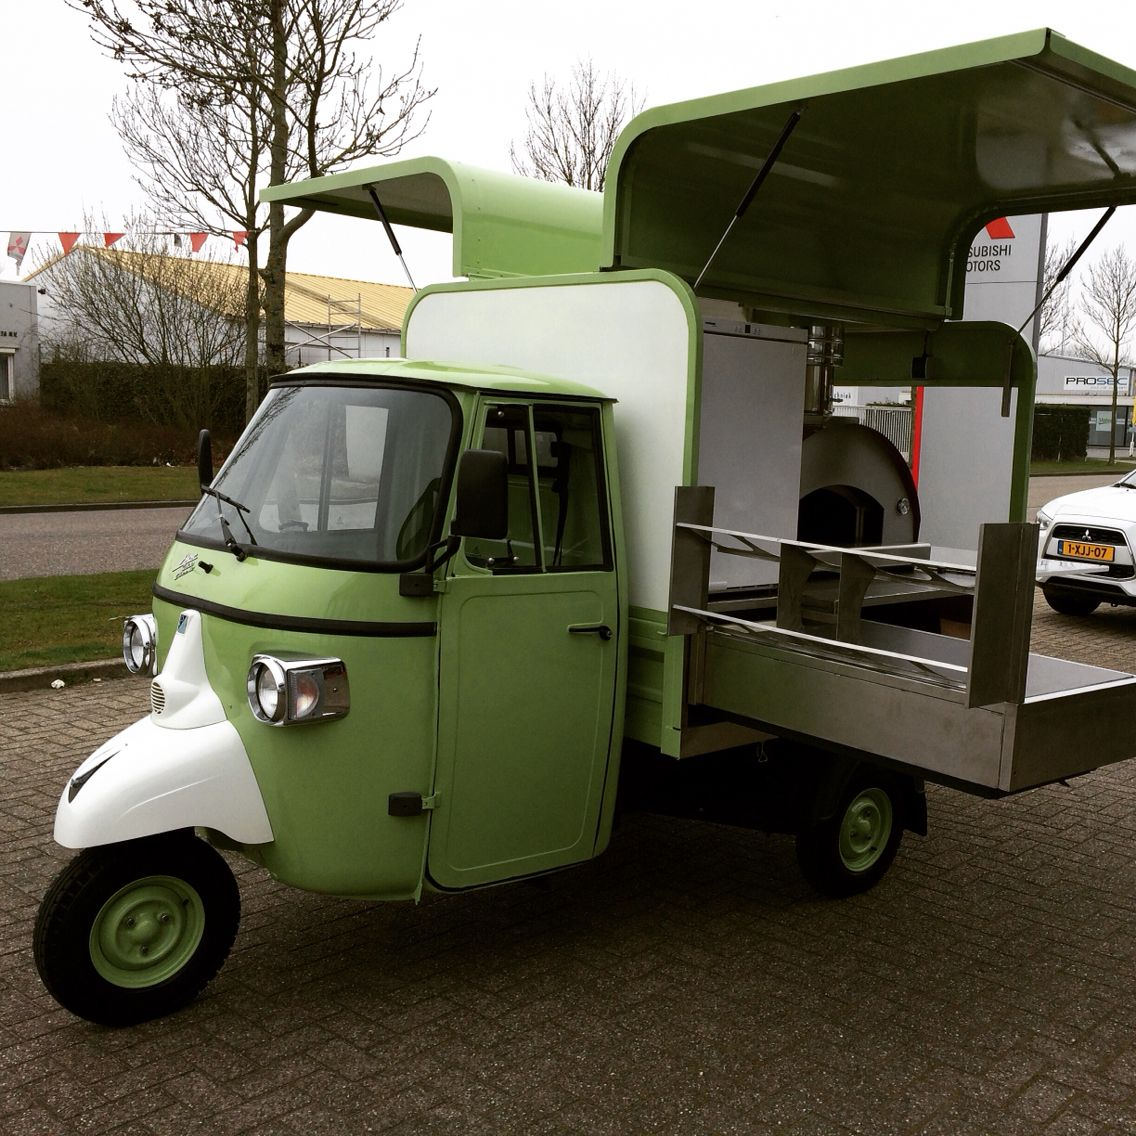 piaggio ape classic 400 pizza oven street food. Black Bedroom Furniture Sets. Home Design Ideas